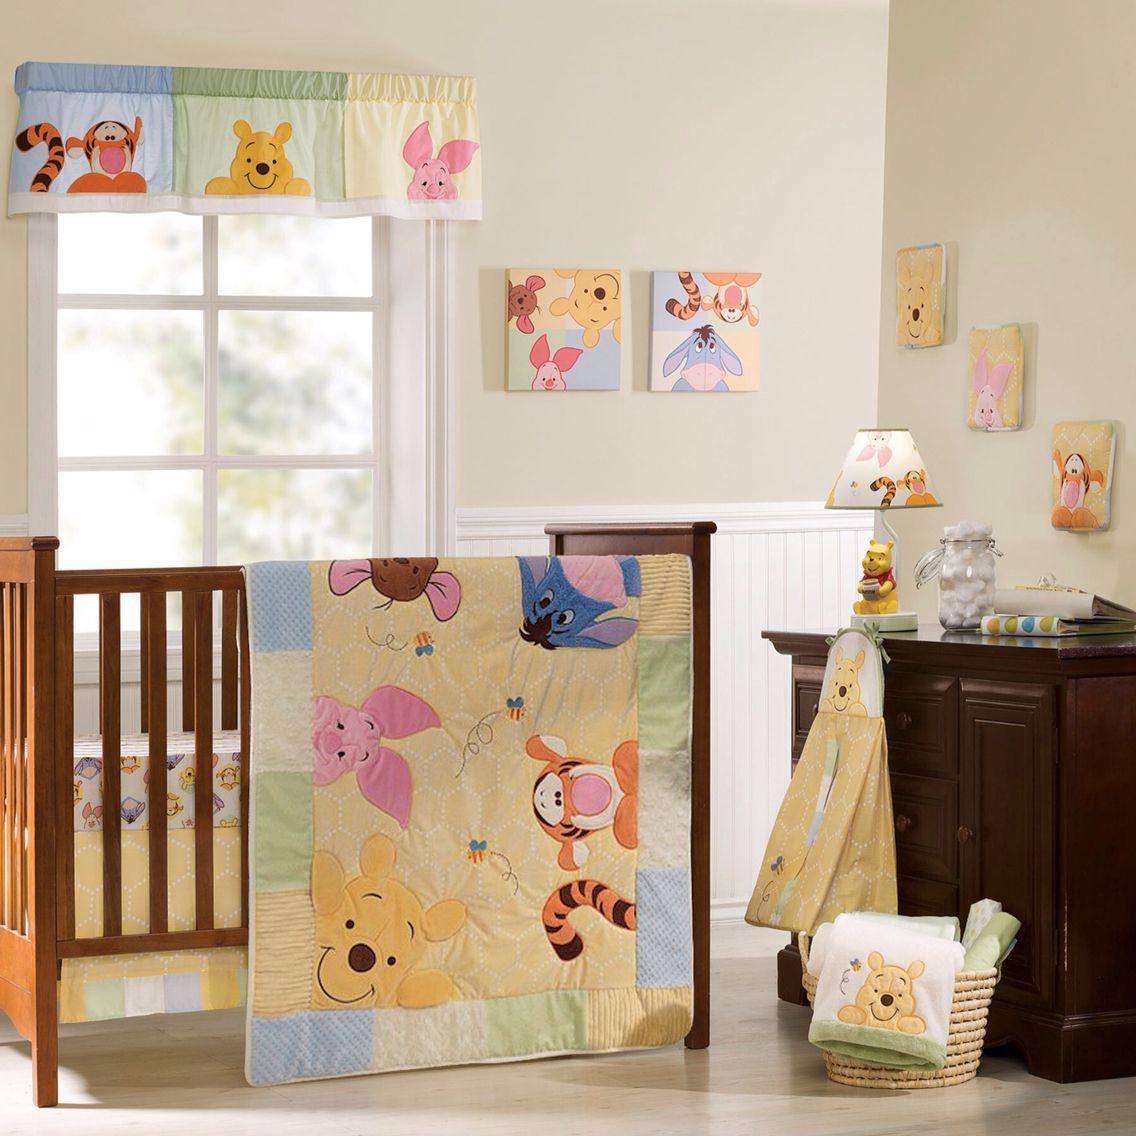 Pooh Bear Winnie The Pooh Nursery Baby Nursery Themes Baby Decor